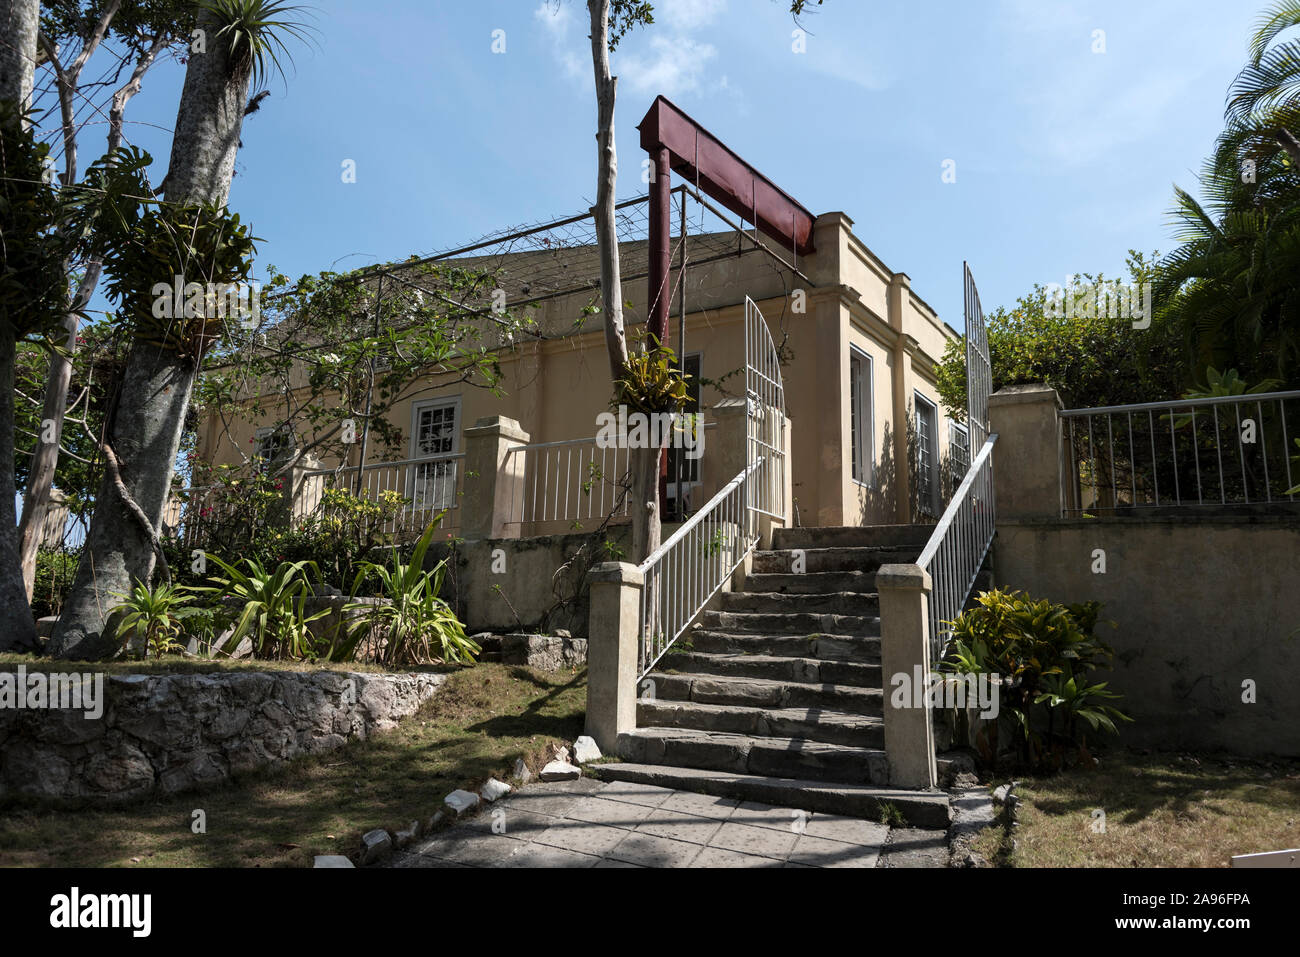 American author, Ernest Hemingway's home, Finca La Vigia, in San Francisco de Paula, southeast of Havana city centre in Cuba.    The house was given t Stock Photo